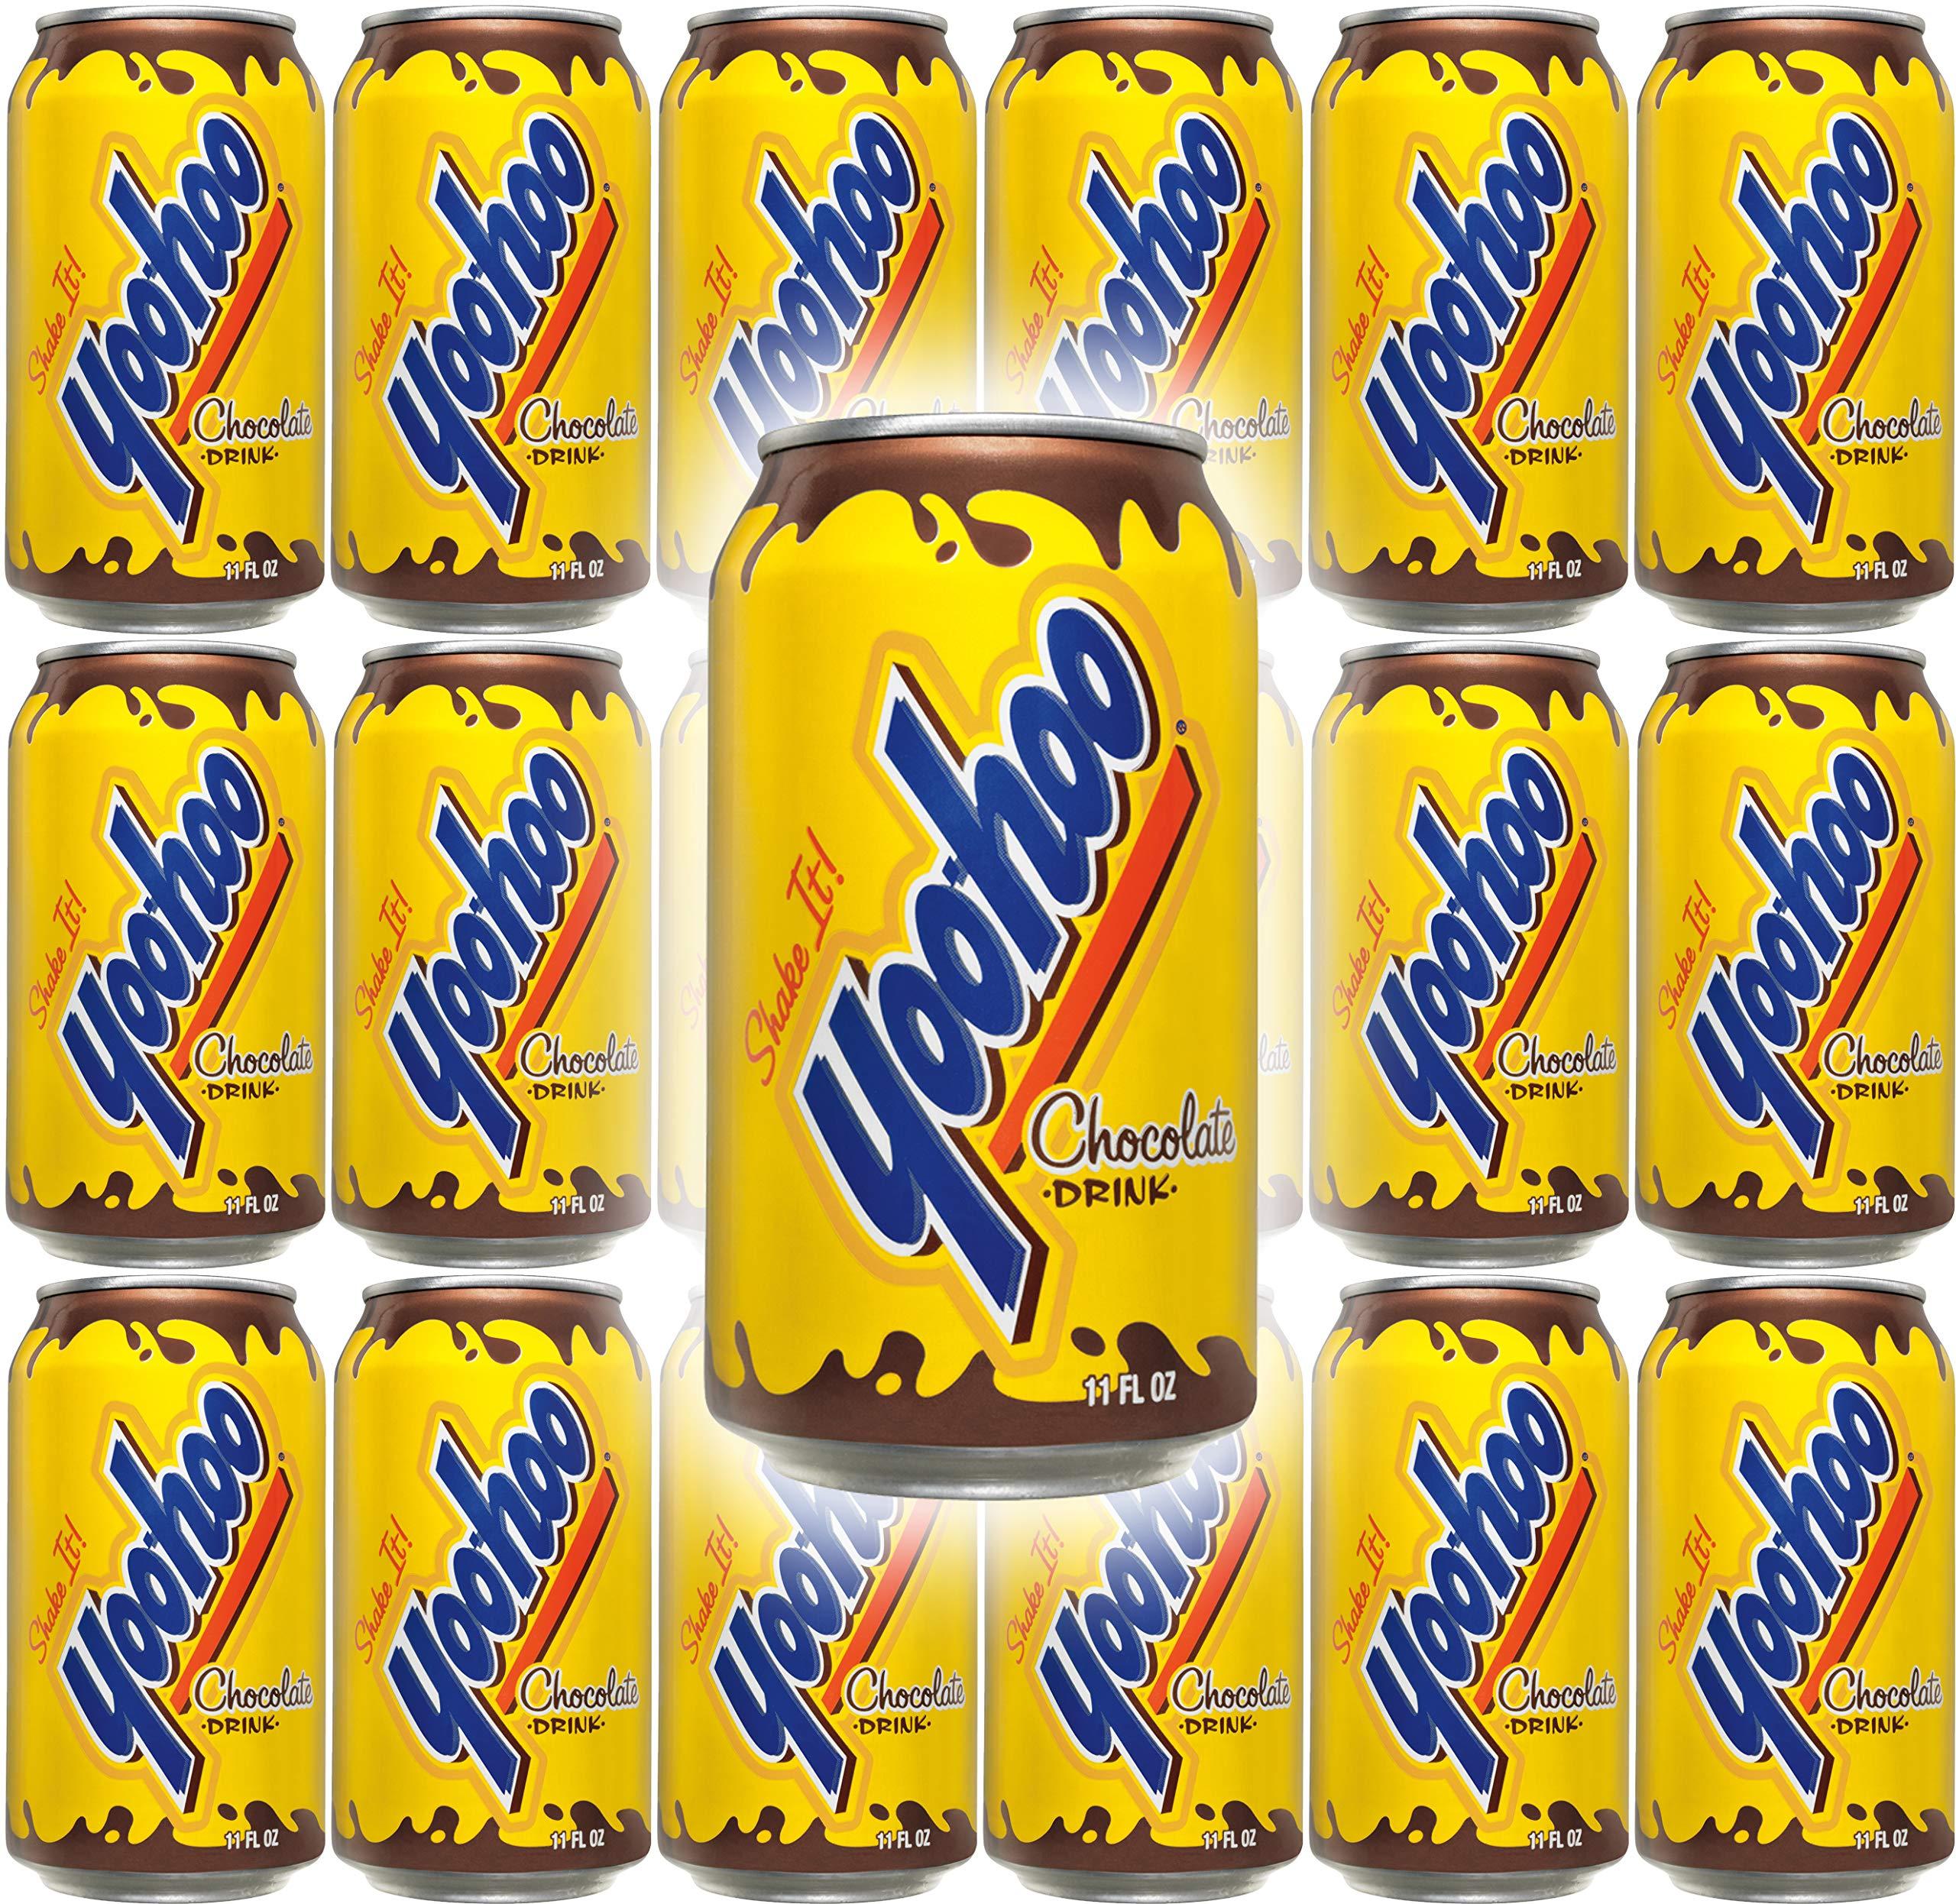 Yoo-Hoo Chocolate Drink, 11 oz Can (Pack of 18, Total of 198 Oz)